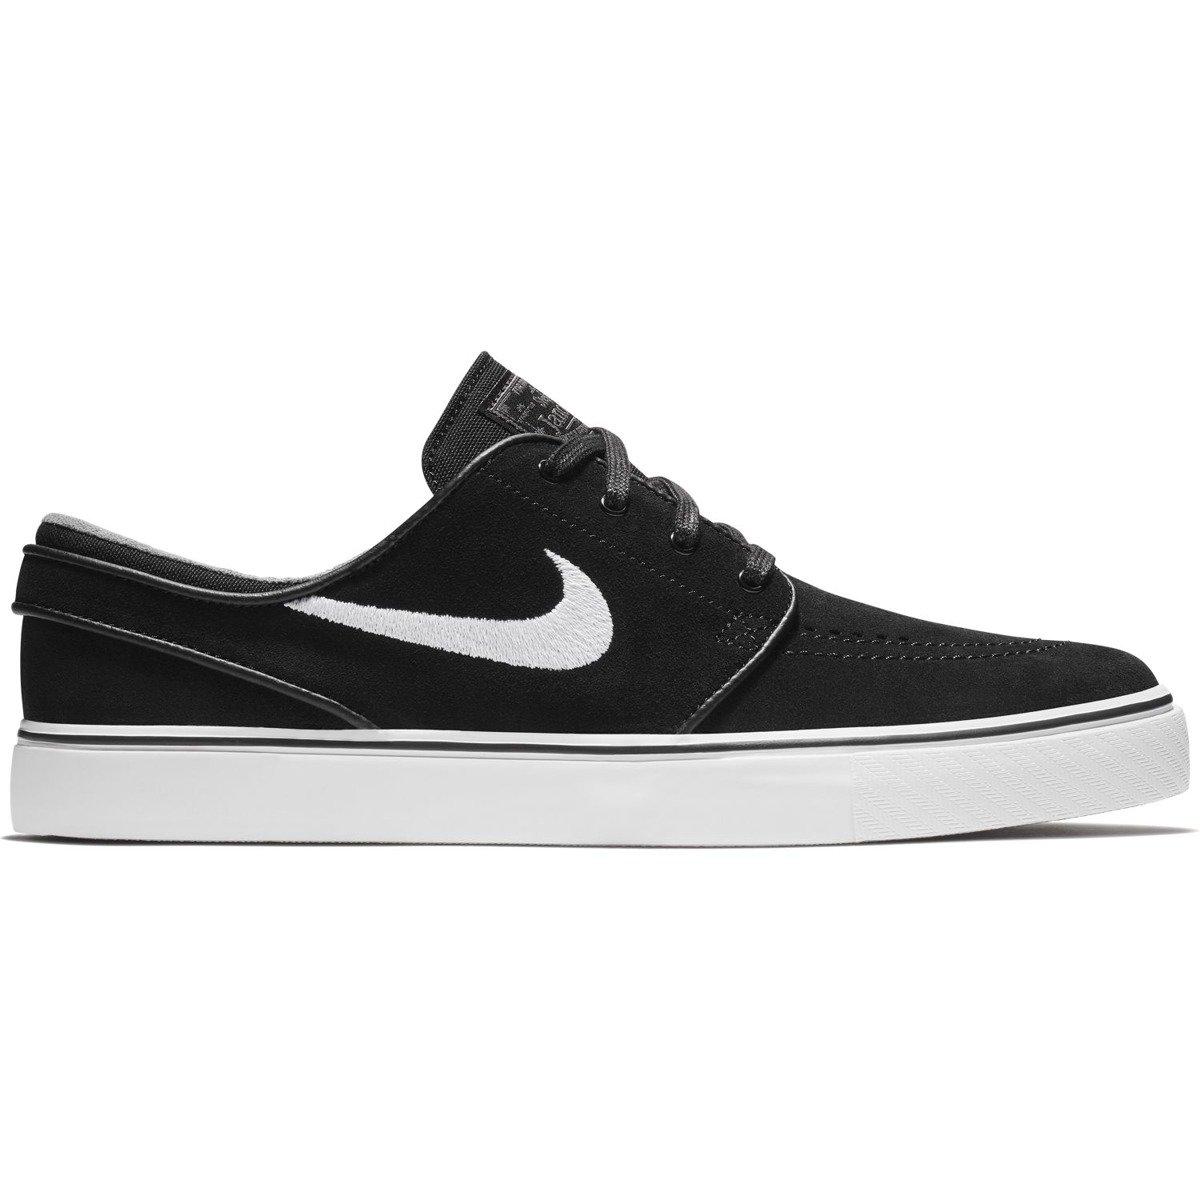 new styles ec0a9 b7a39 nike zoom stefan janoski blackwhite-thunder grey-gum light brown black   Shoes  Nike SB Shoes  nike janoski Brands  Nike SB SALE  Sale - 40%   Shoes ...